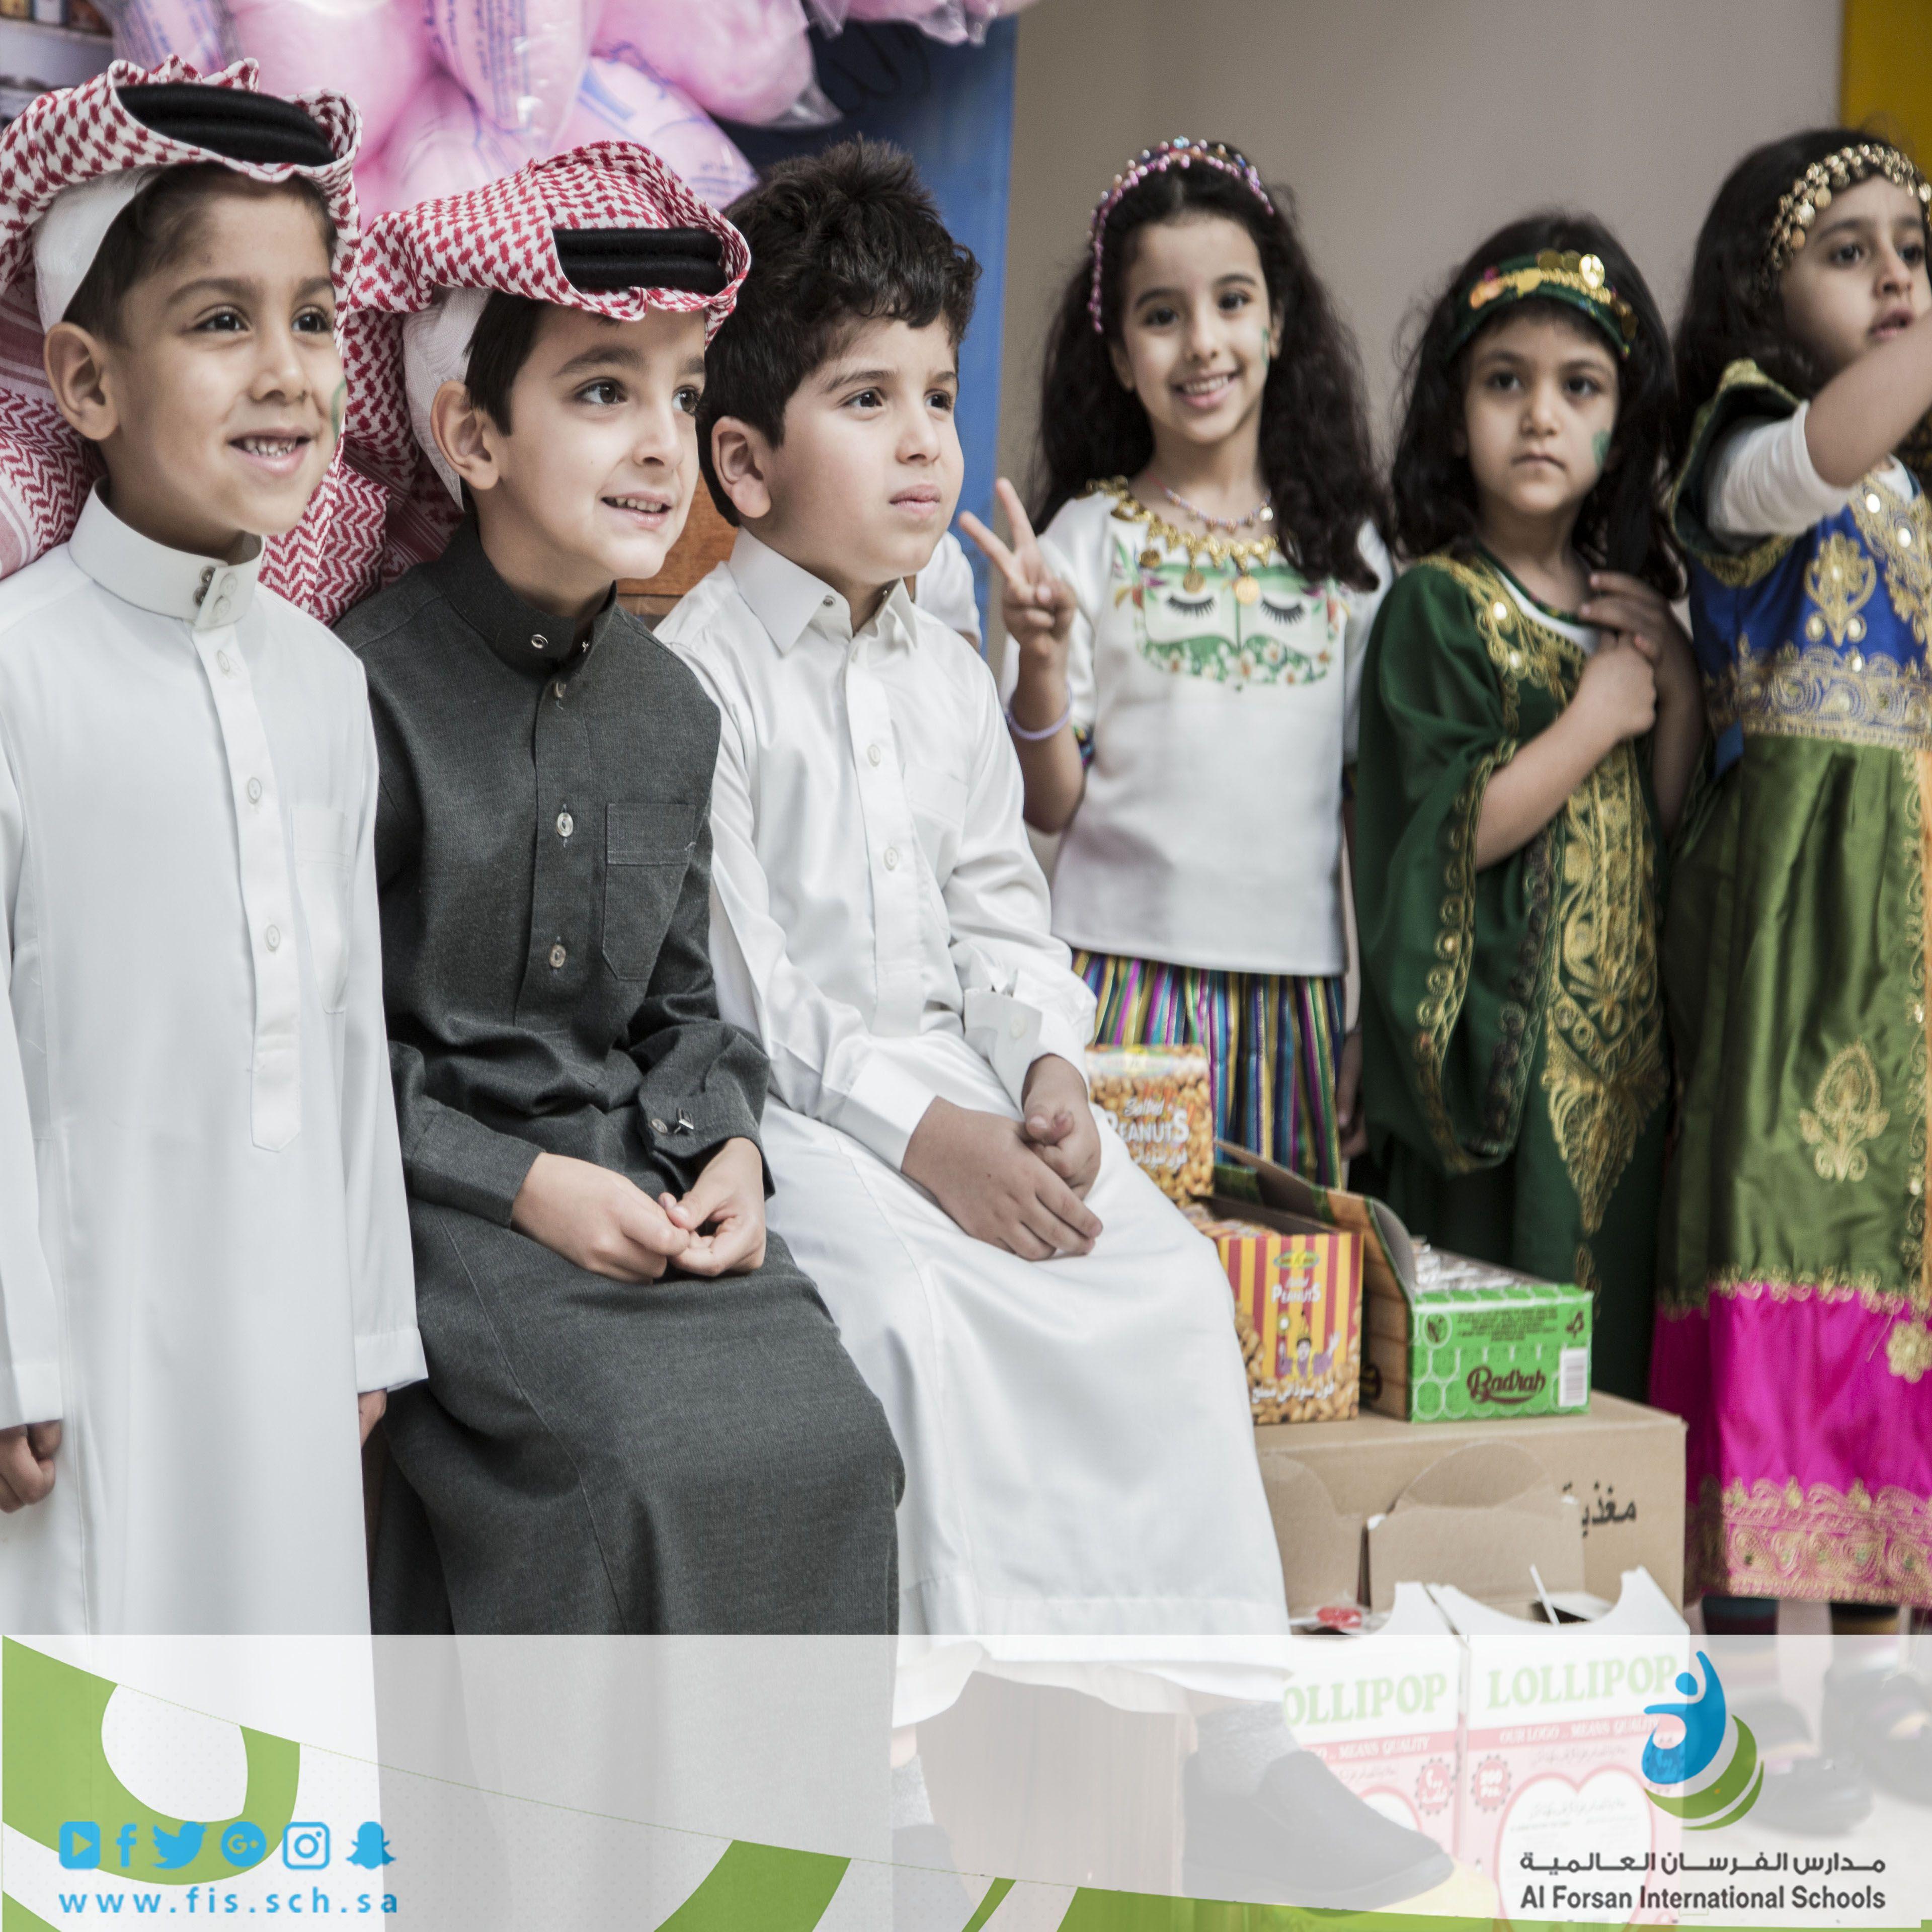 Al Forsan International Schools International School School Lab Coat